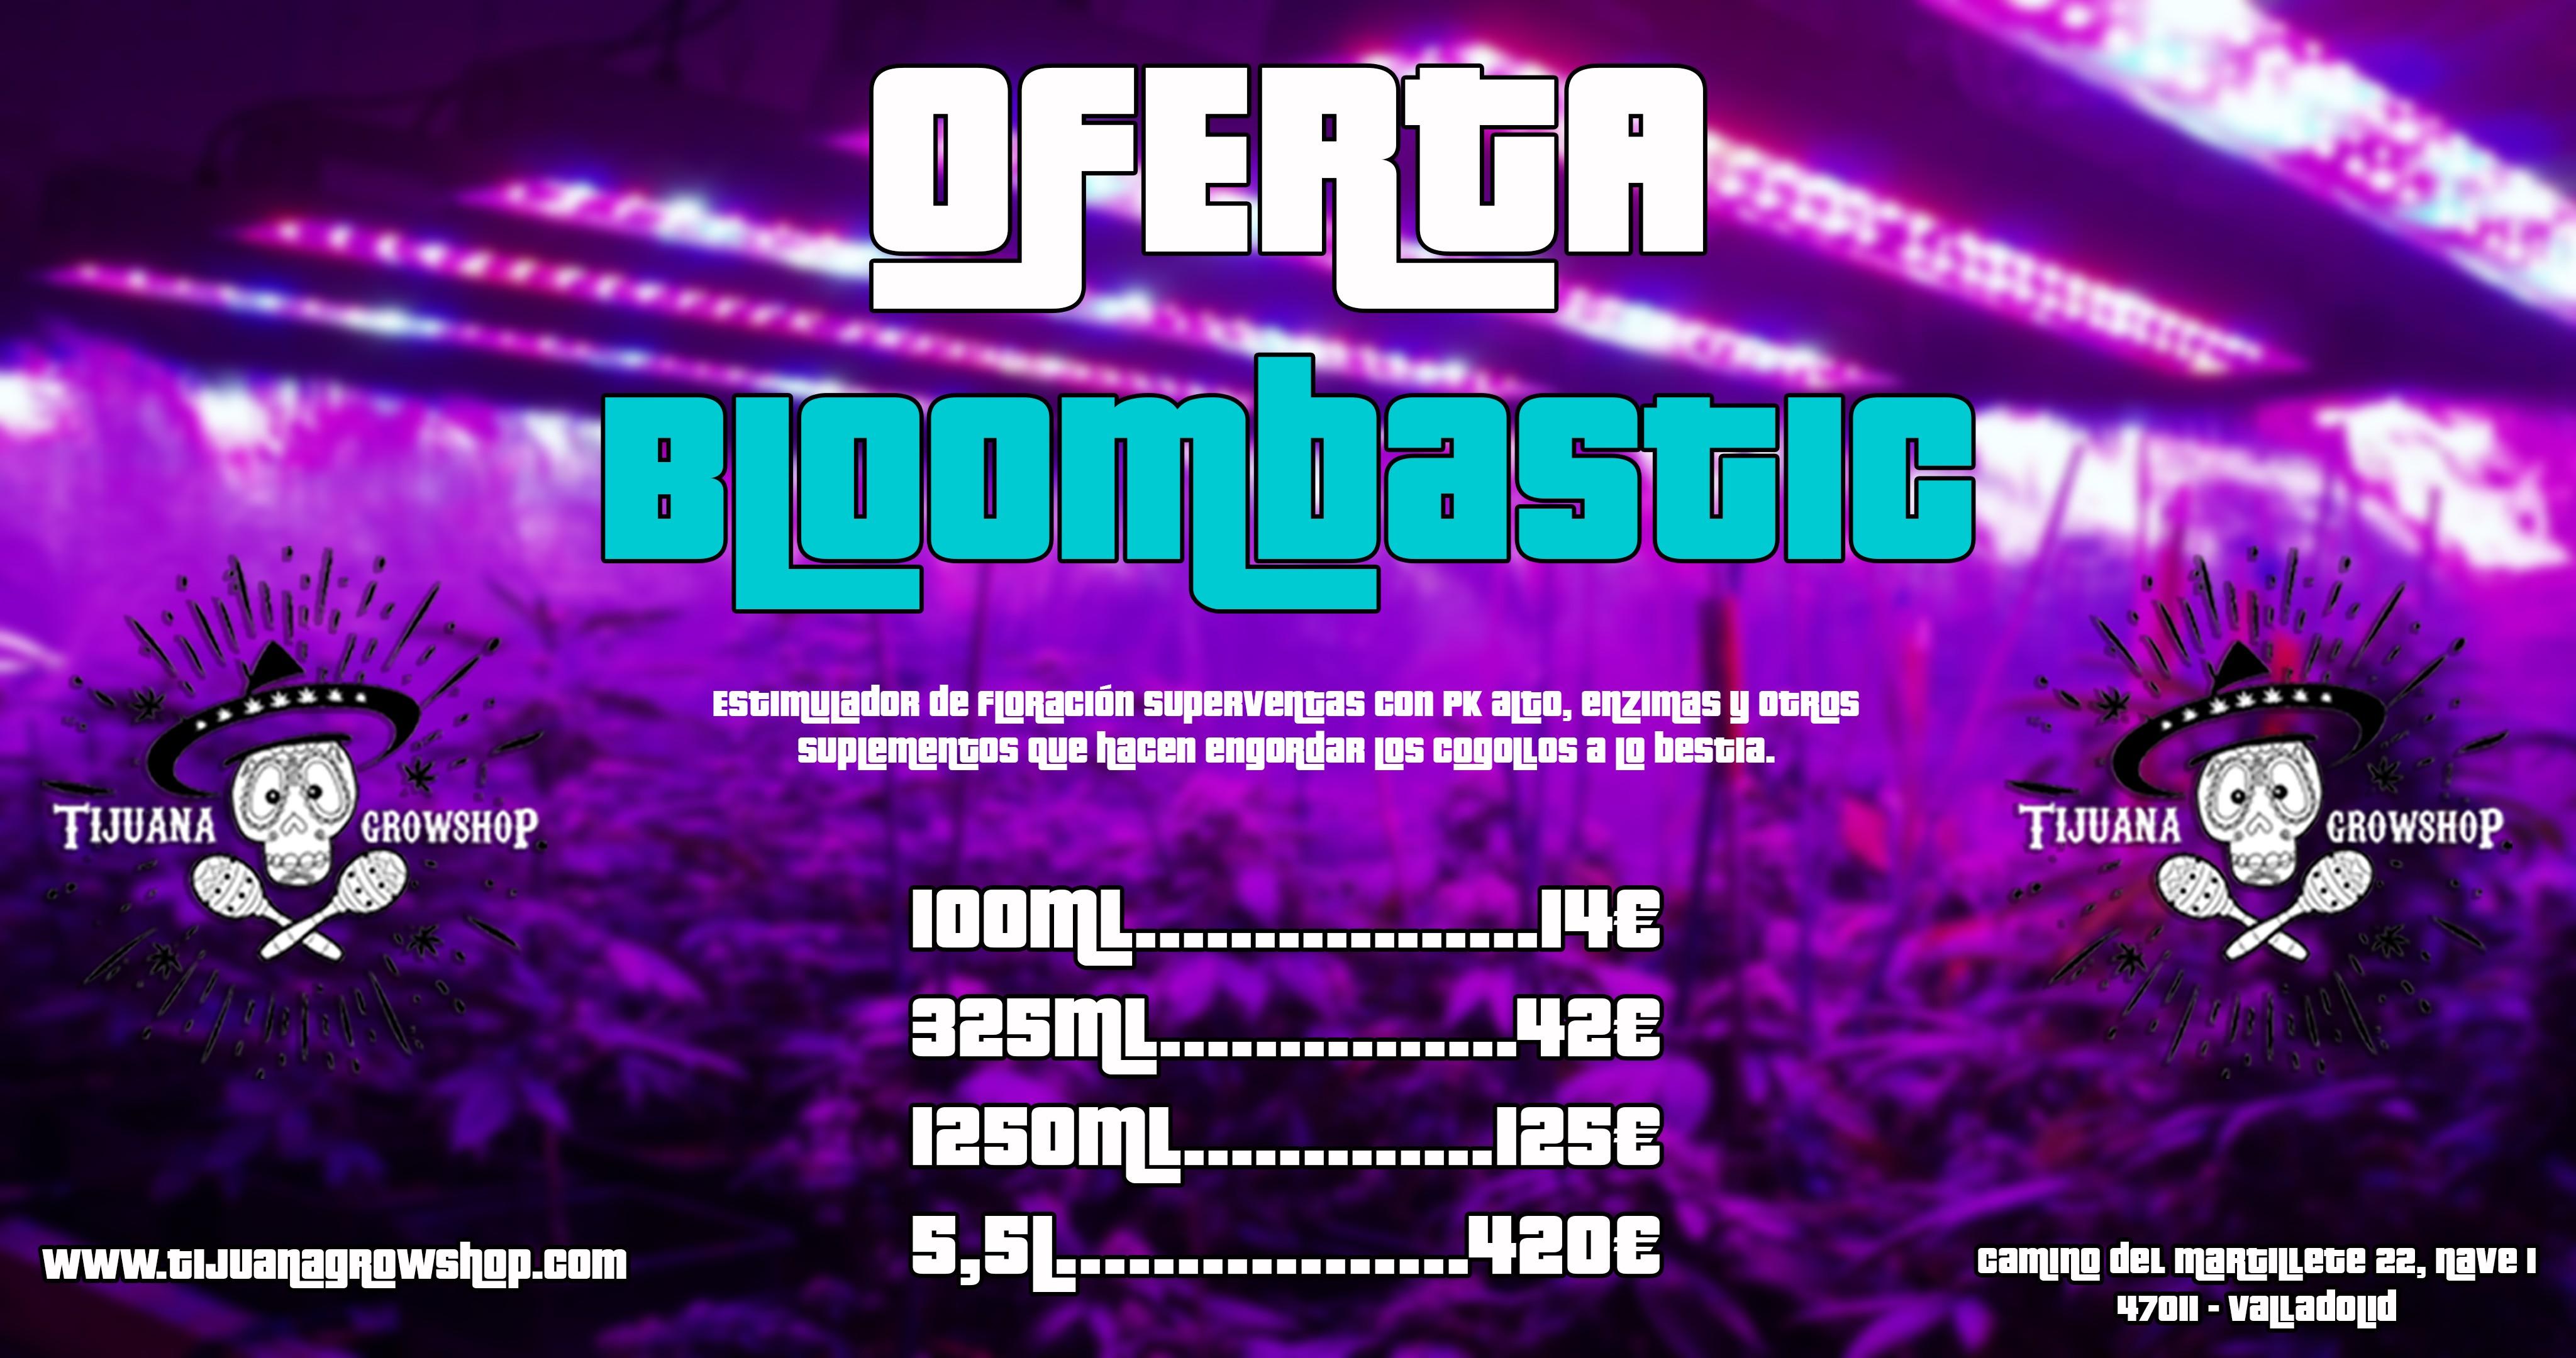 oferta Bloombastic